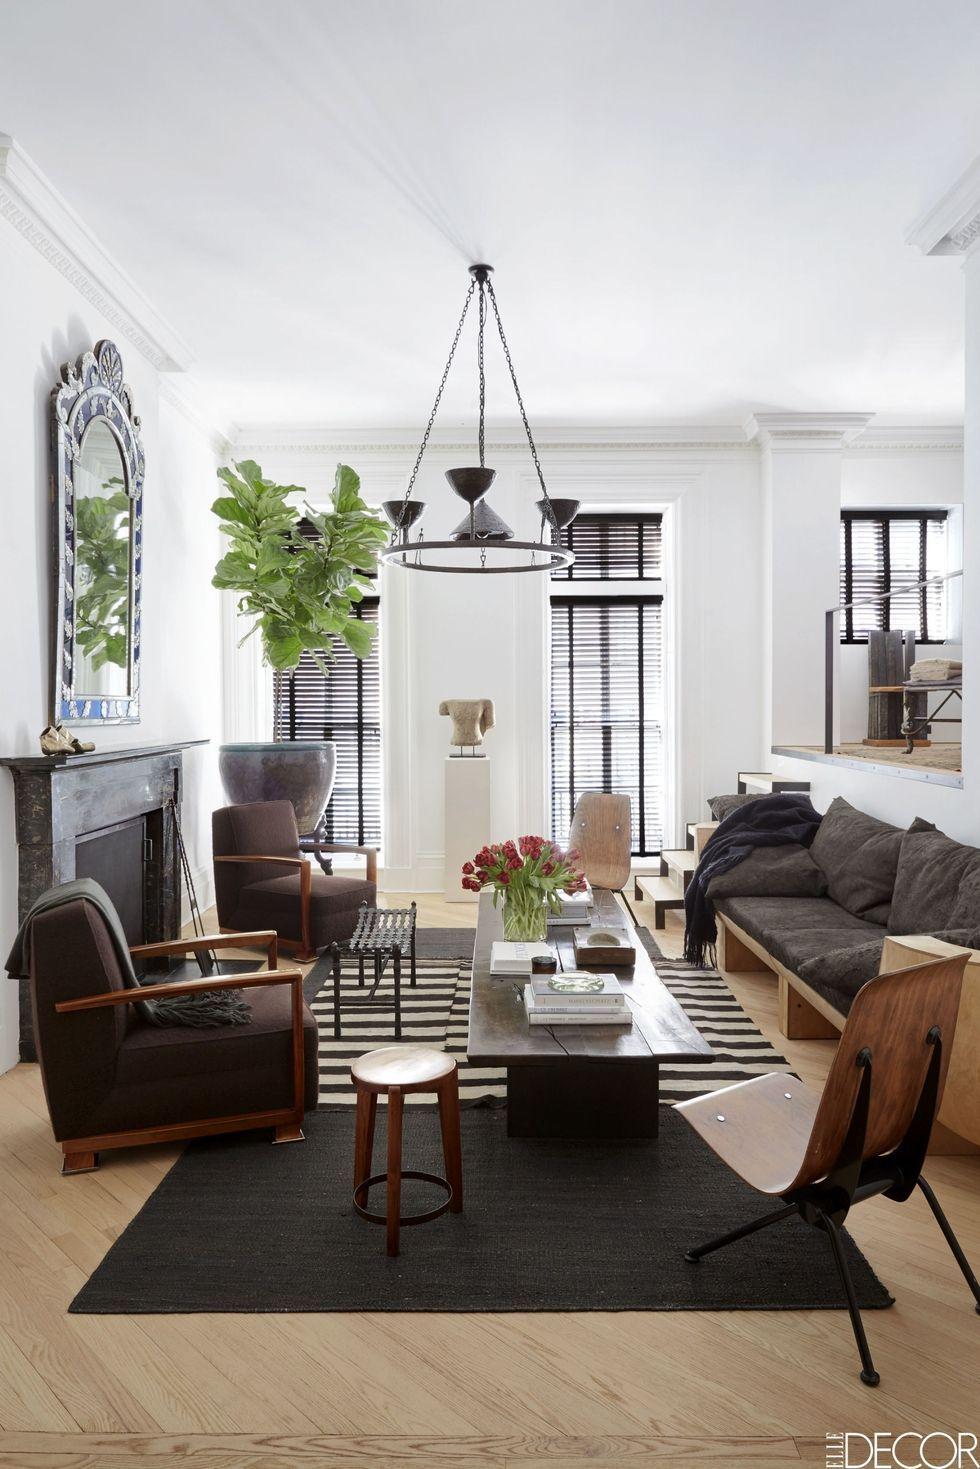 Futuristic Design Ideas For Small Living Room Design